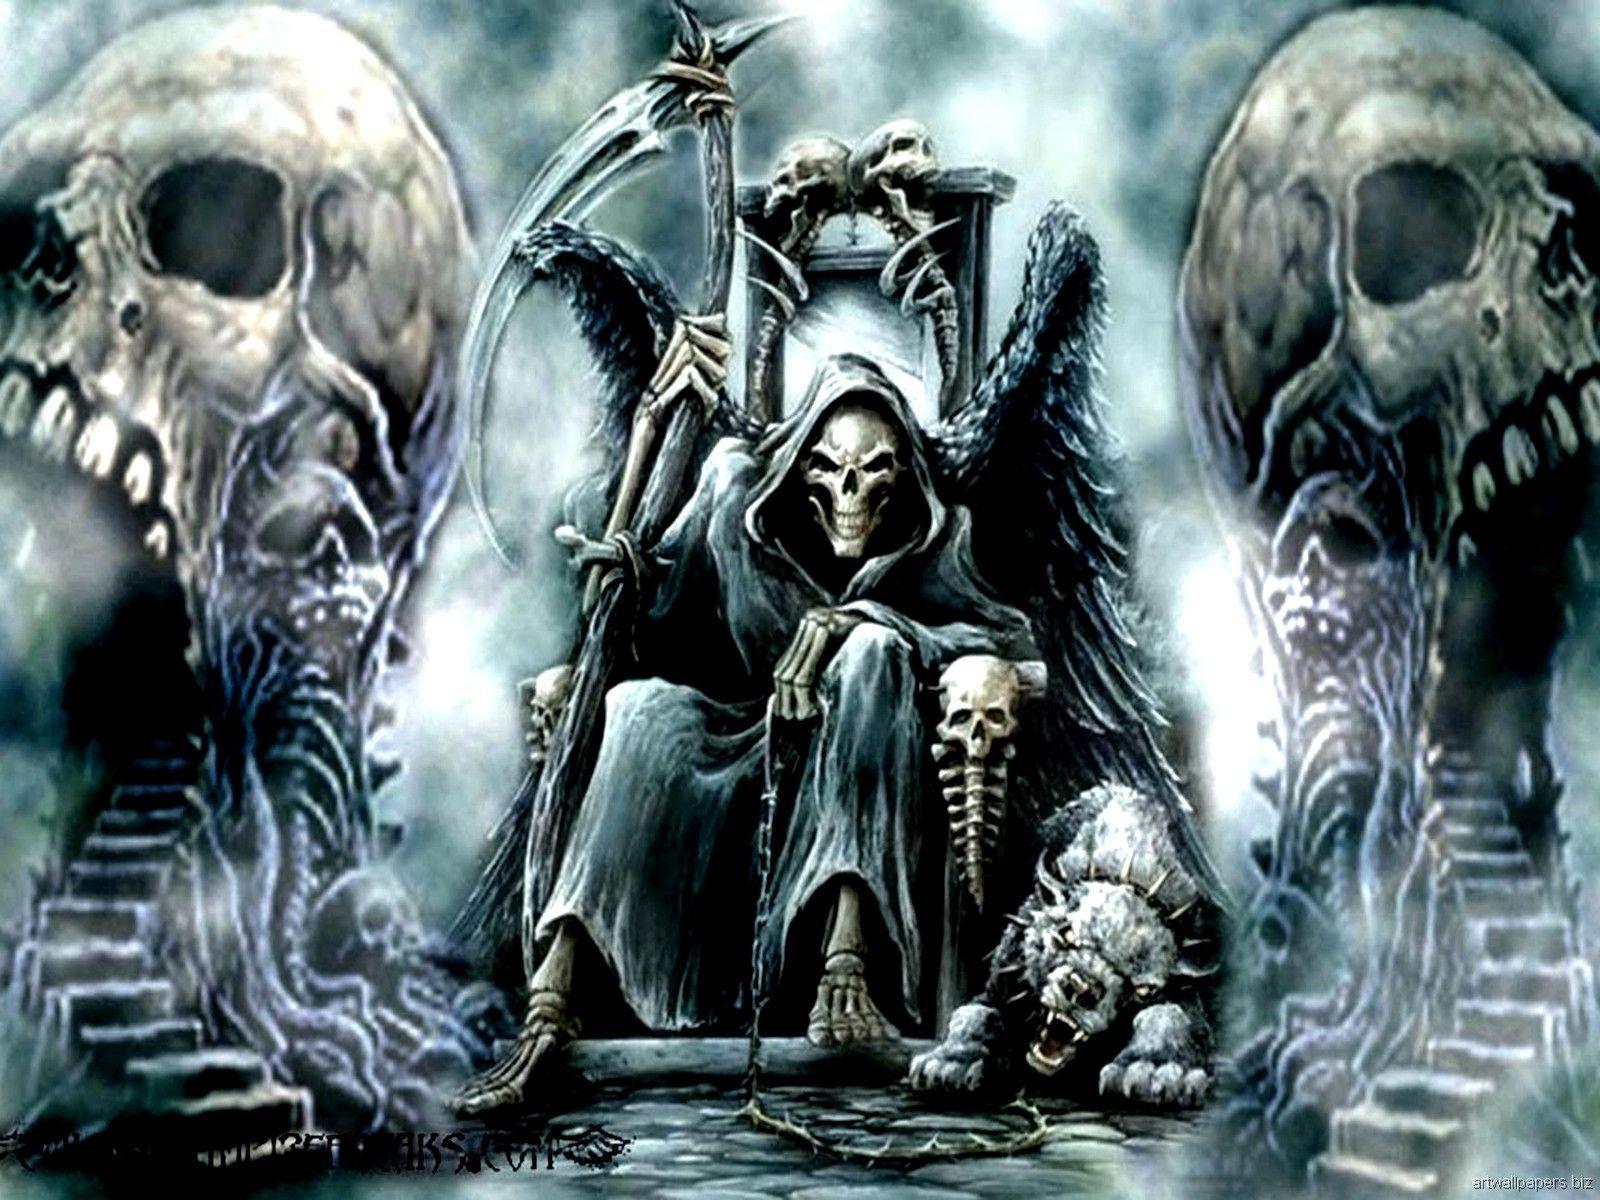 Uyisoex Jpg 1600 1200 Skull Wallpaper Hd Skull Wallpapers Grim Reaper Art